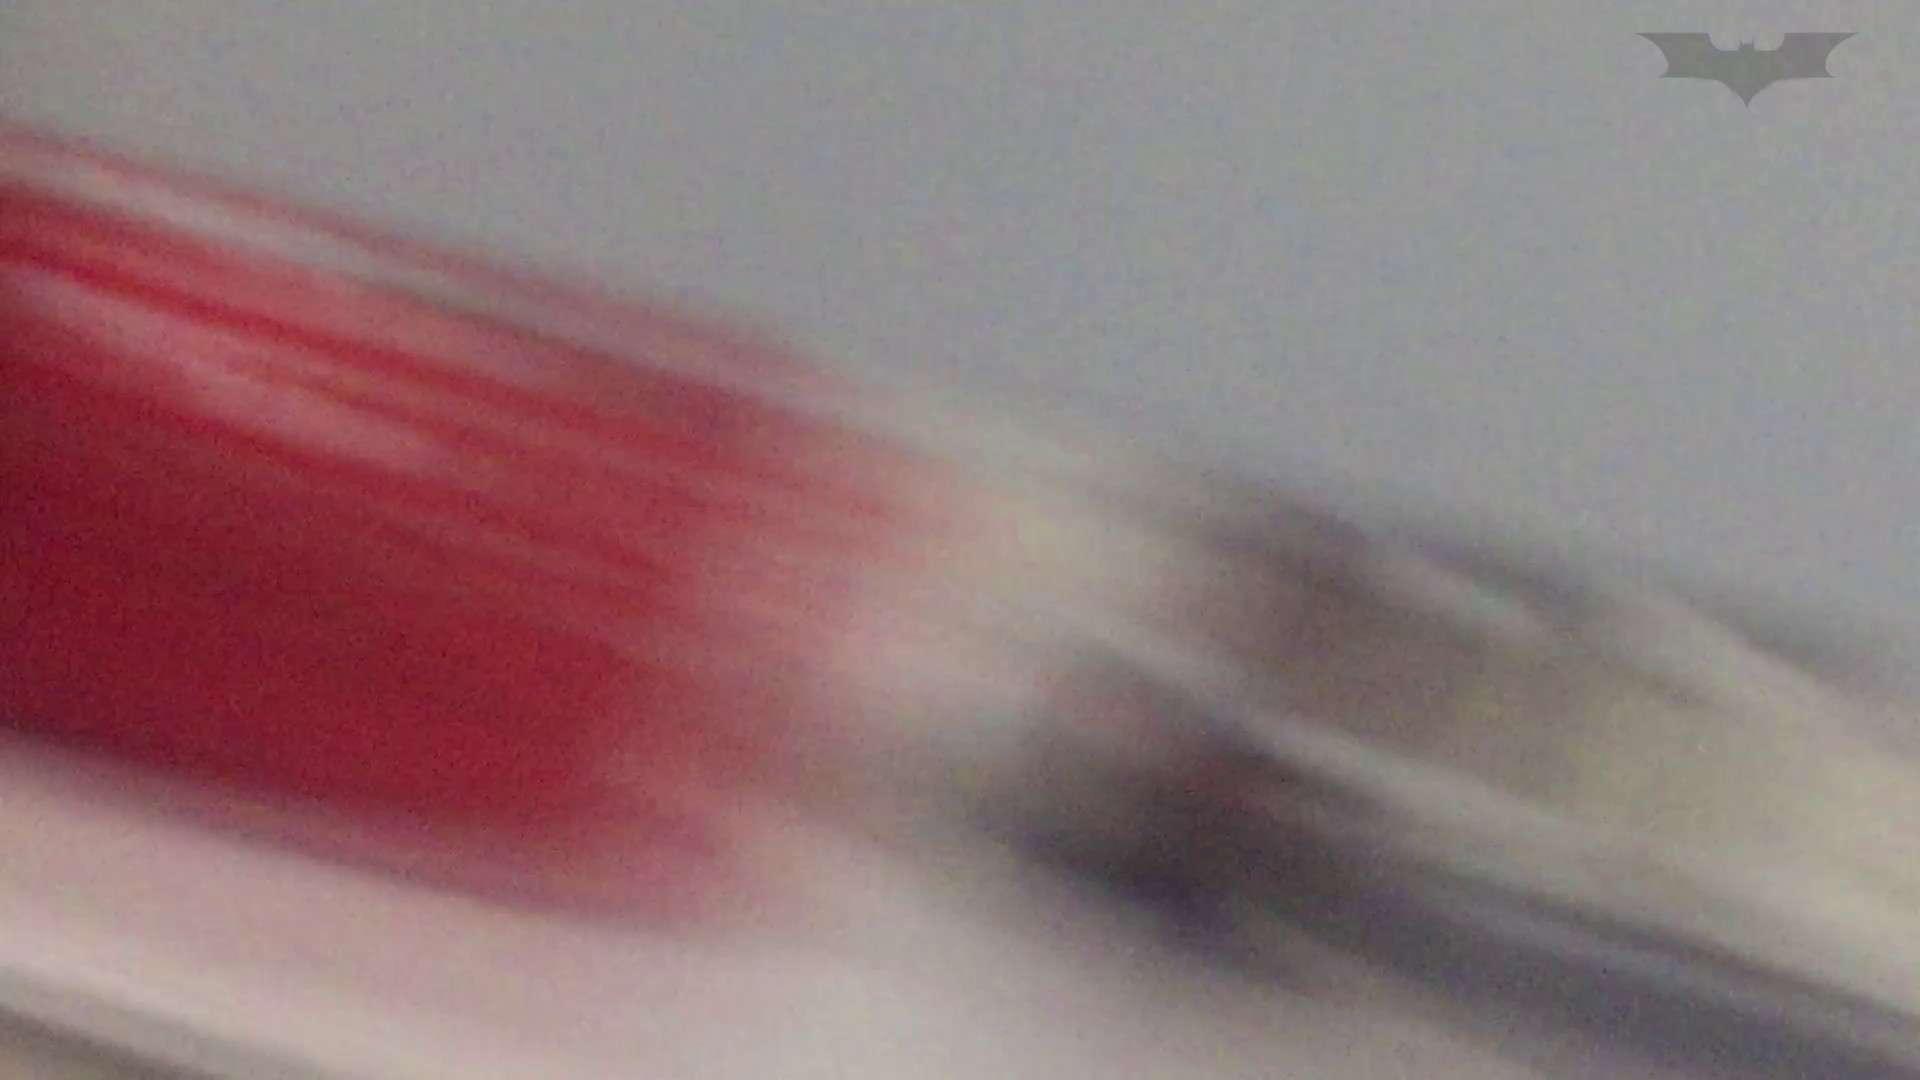 JD盗撮 美女の洗面所の秘密 Vol.70 盛合せ 性交動画流出 89画像 25